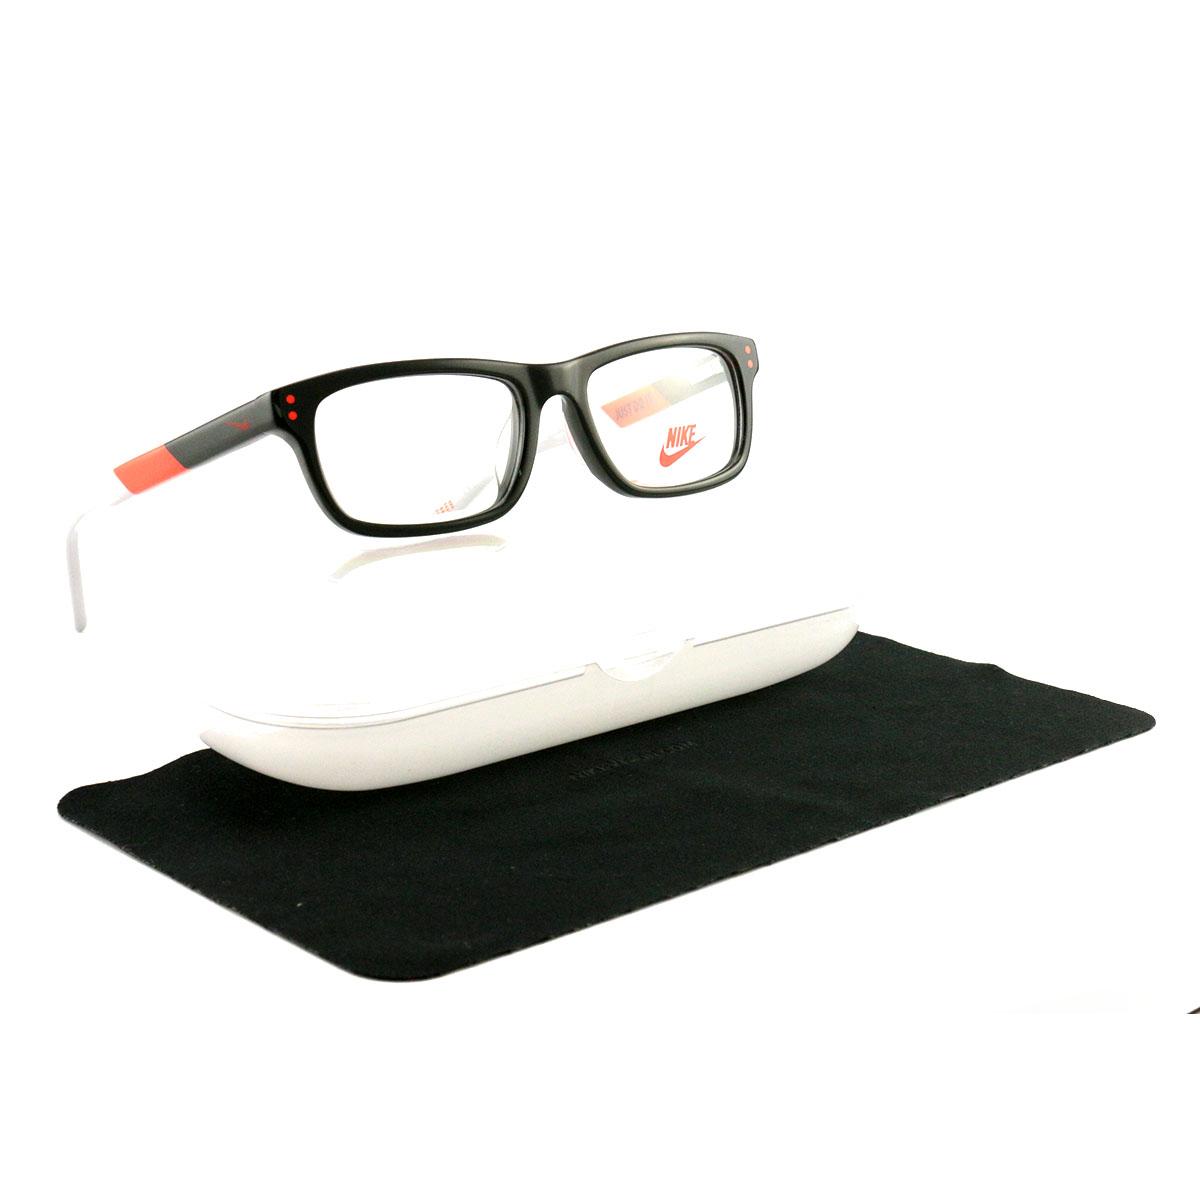 96d9a9bf894 Details about Nike Eyeglasses NIKE 5535 068 Dark Gray 45 14 125 Plastic  Demo Lens